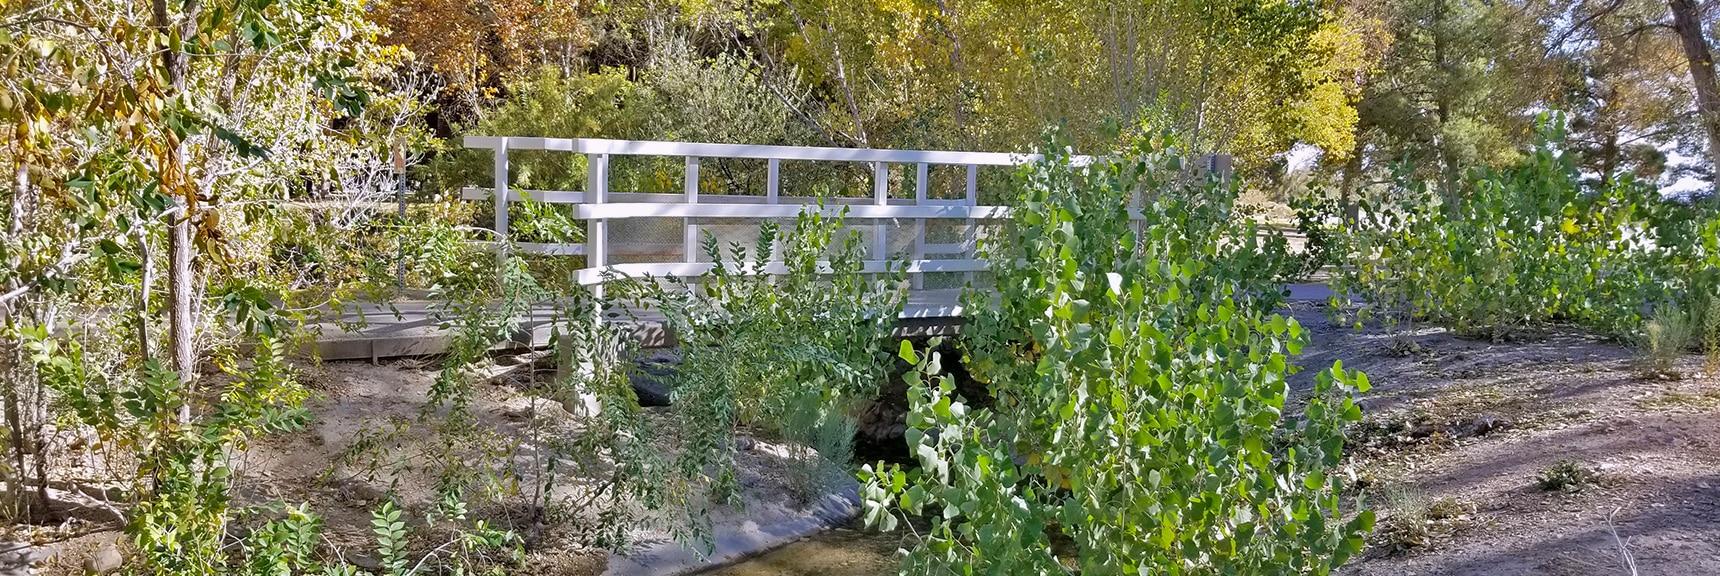 Bridge Over a Stream at Floyd Lamb Park   Centennial Hills Mountain Bike Conditioning Adventure Loop, Las Vegas, Nevada